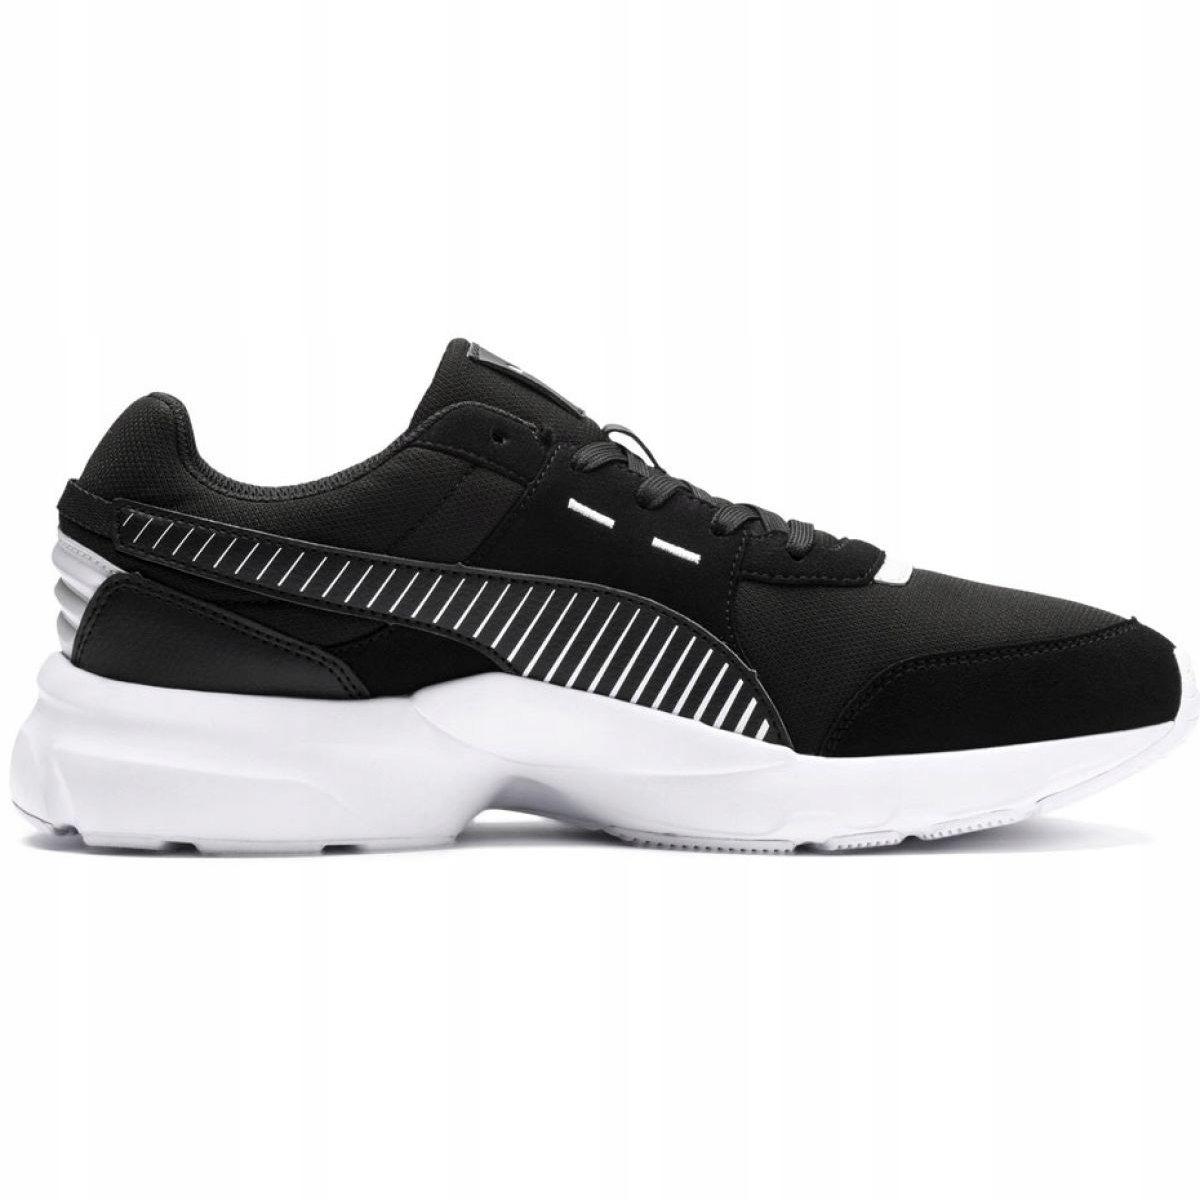 Buty biegowe Puma Future Runner M 368035 01 czarne w 2019